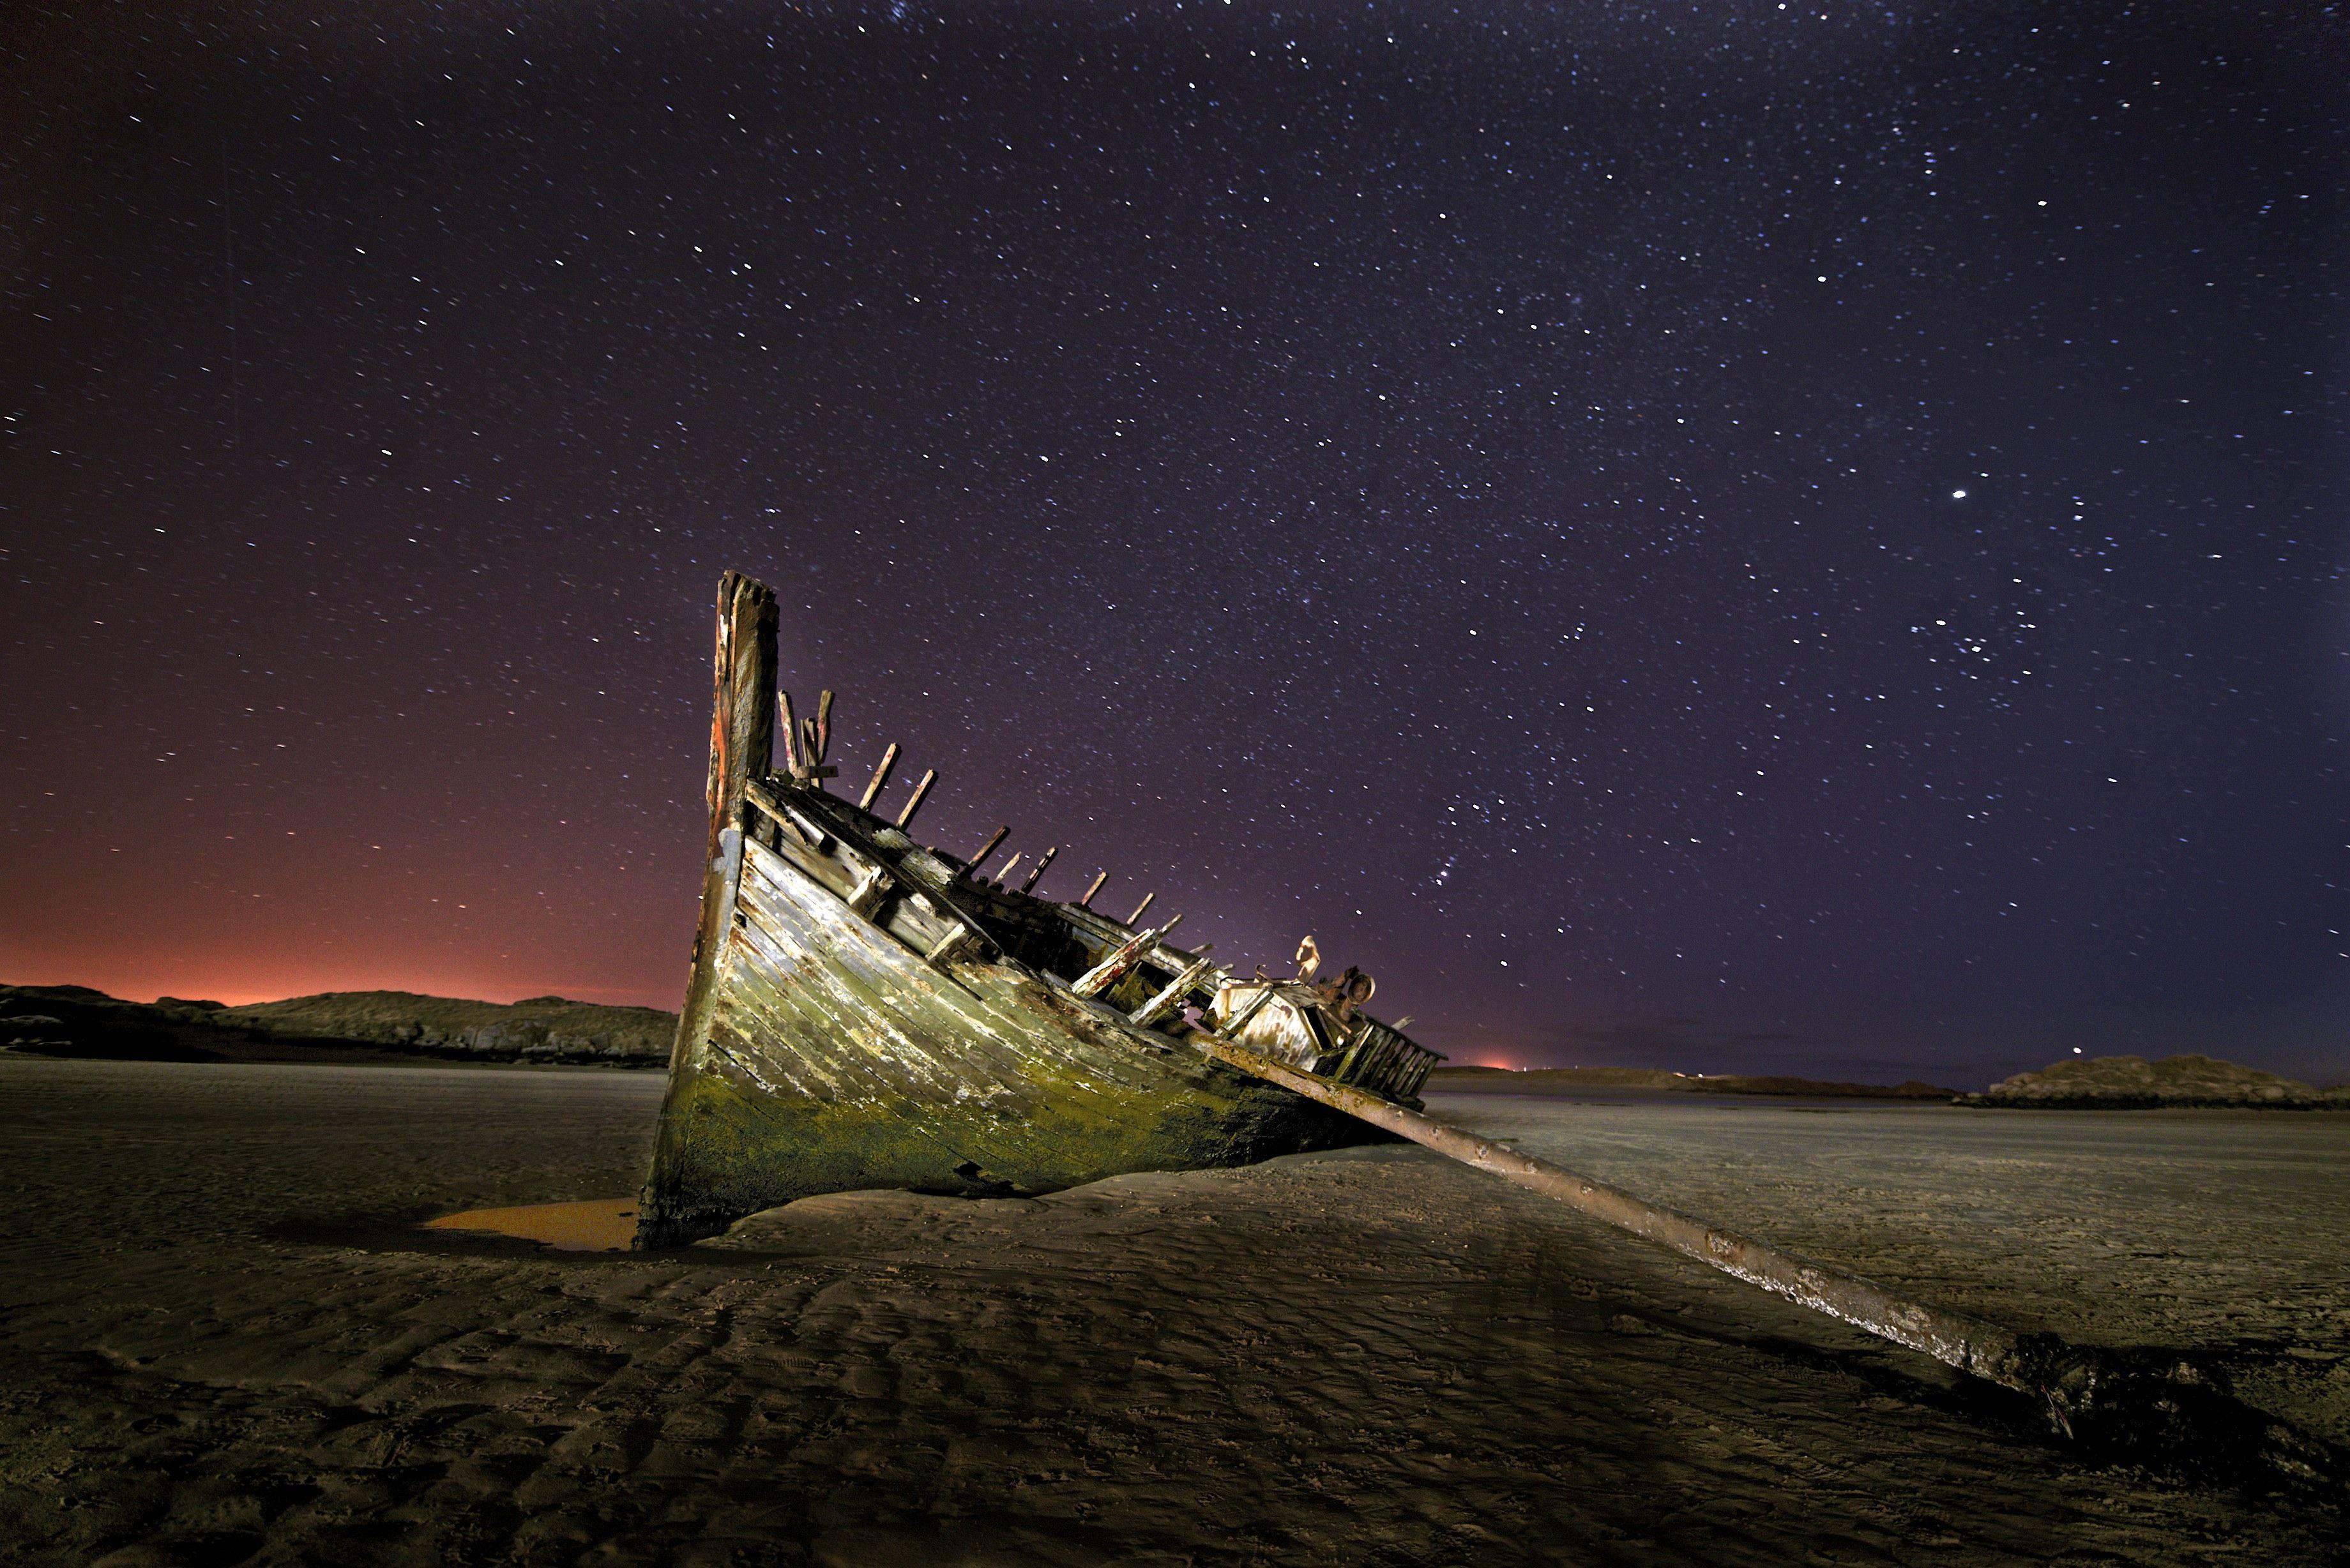 'Bad Eddies' boat wreck at night, Derrybeg, Donegal, Ireland